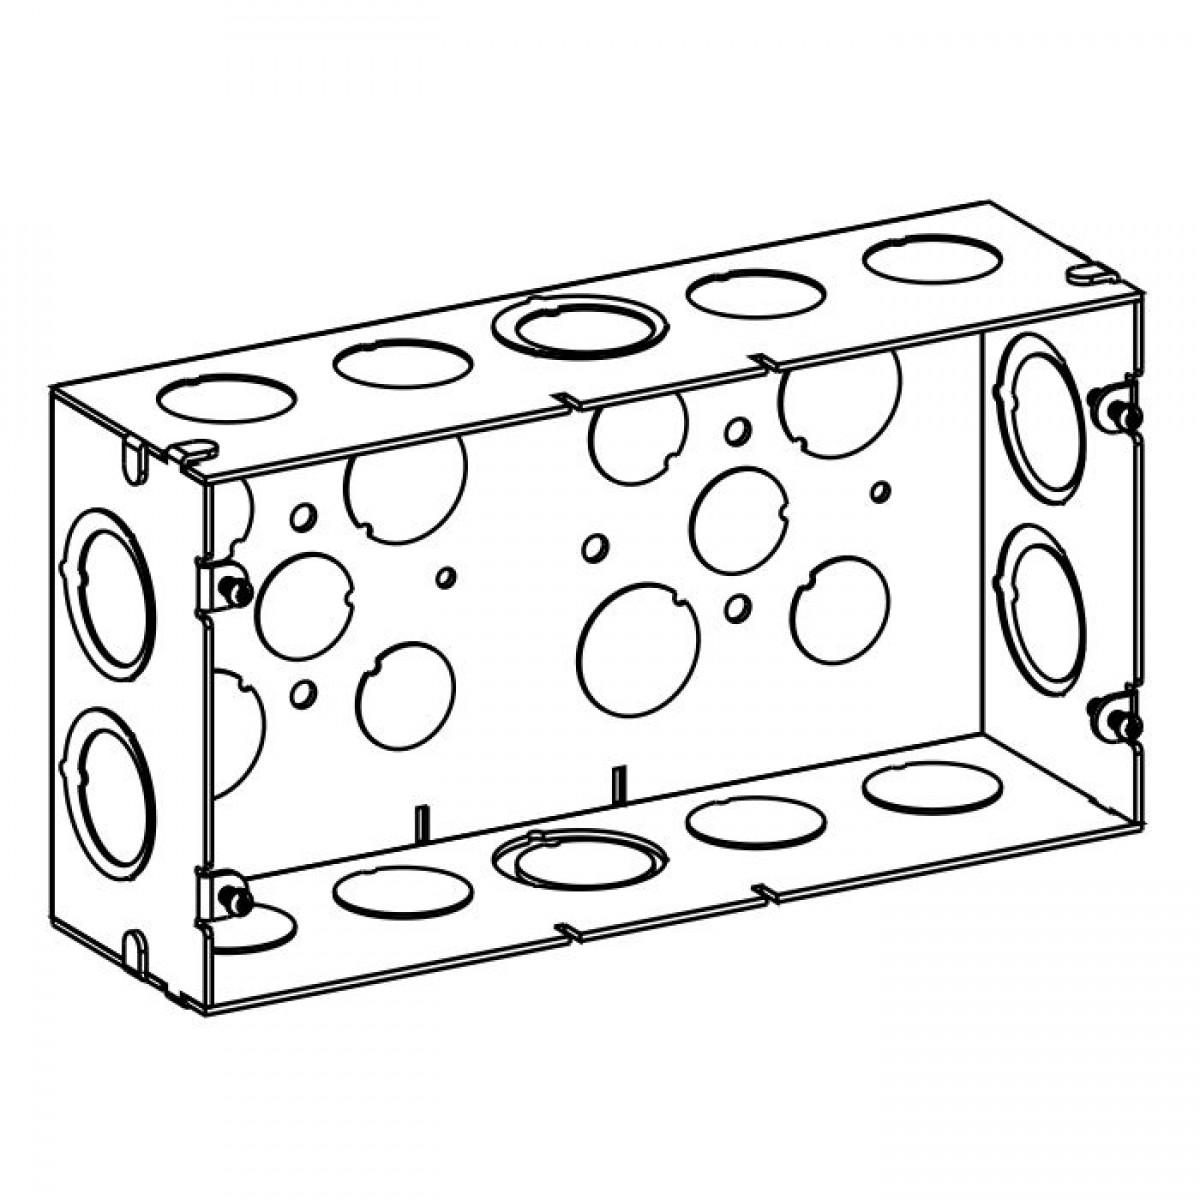 sdb-3 - multigang boxes